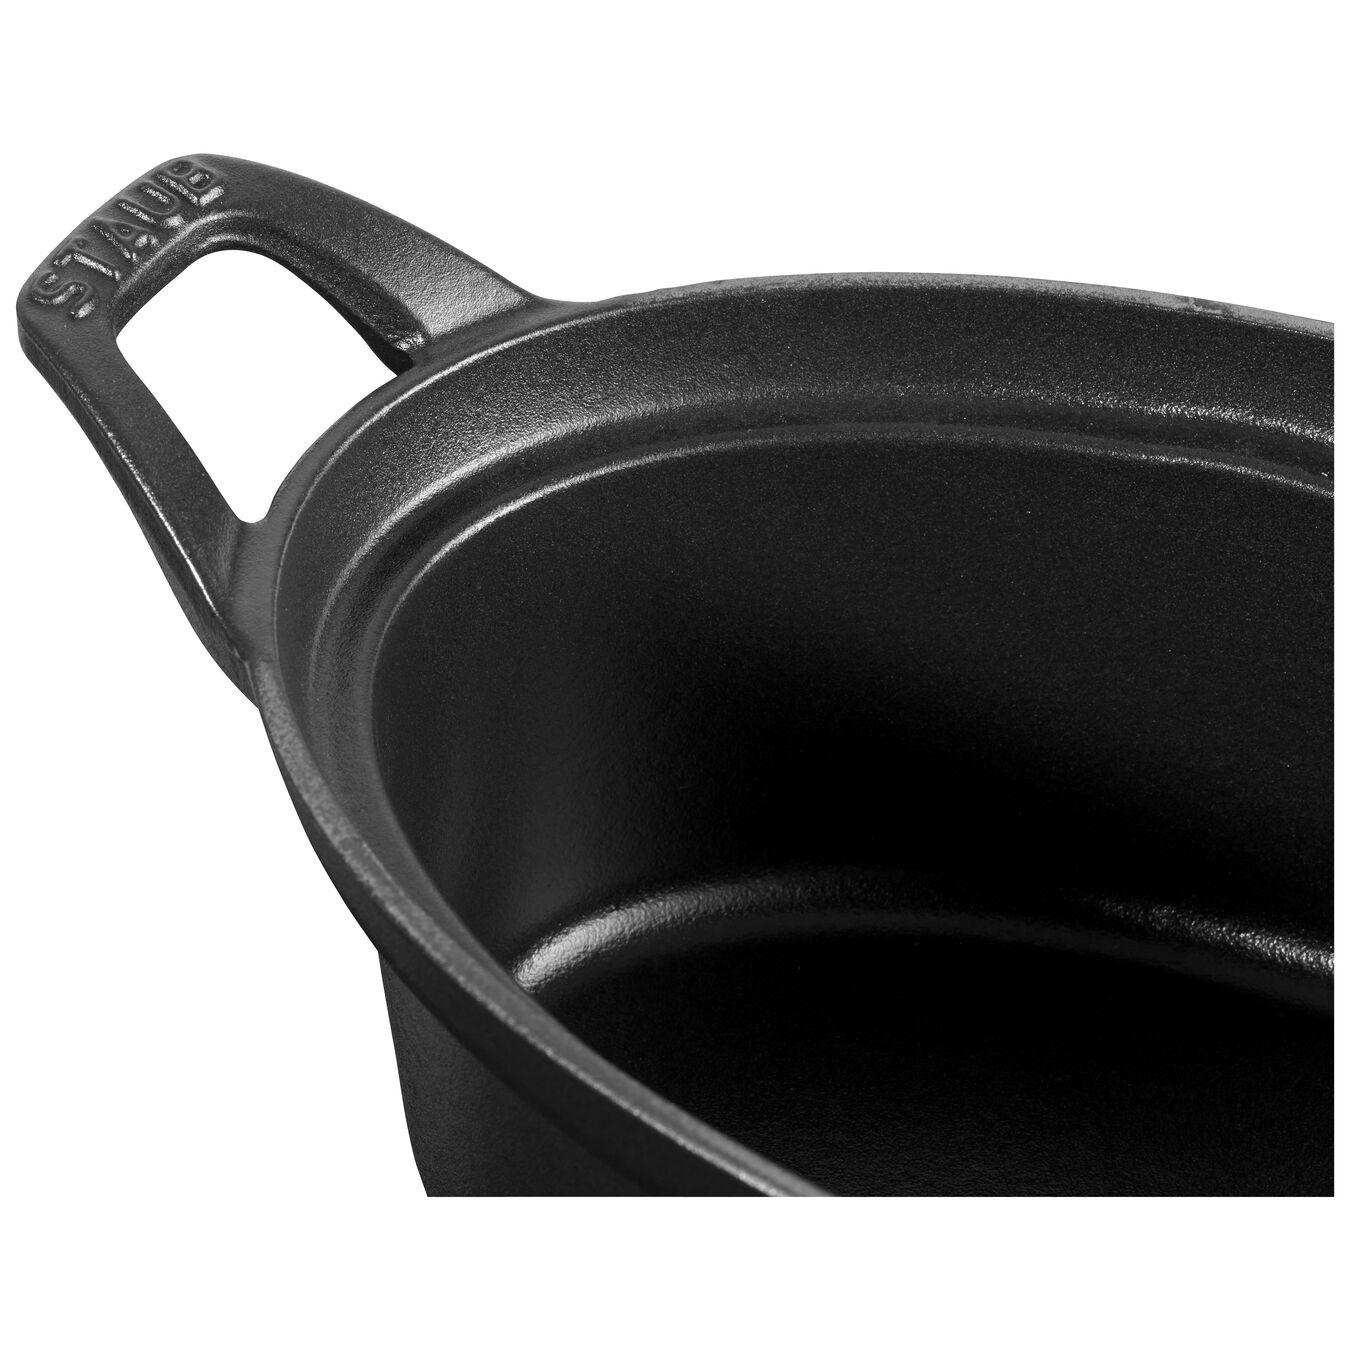 1.7 l Cast iron oval La Coquette, Black,,large 4